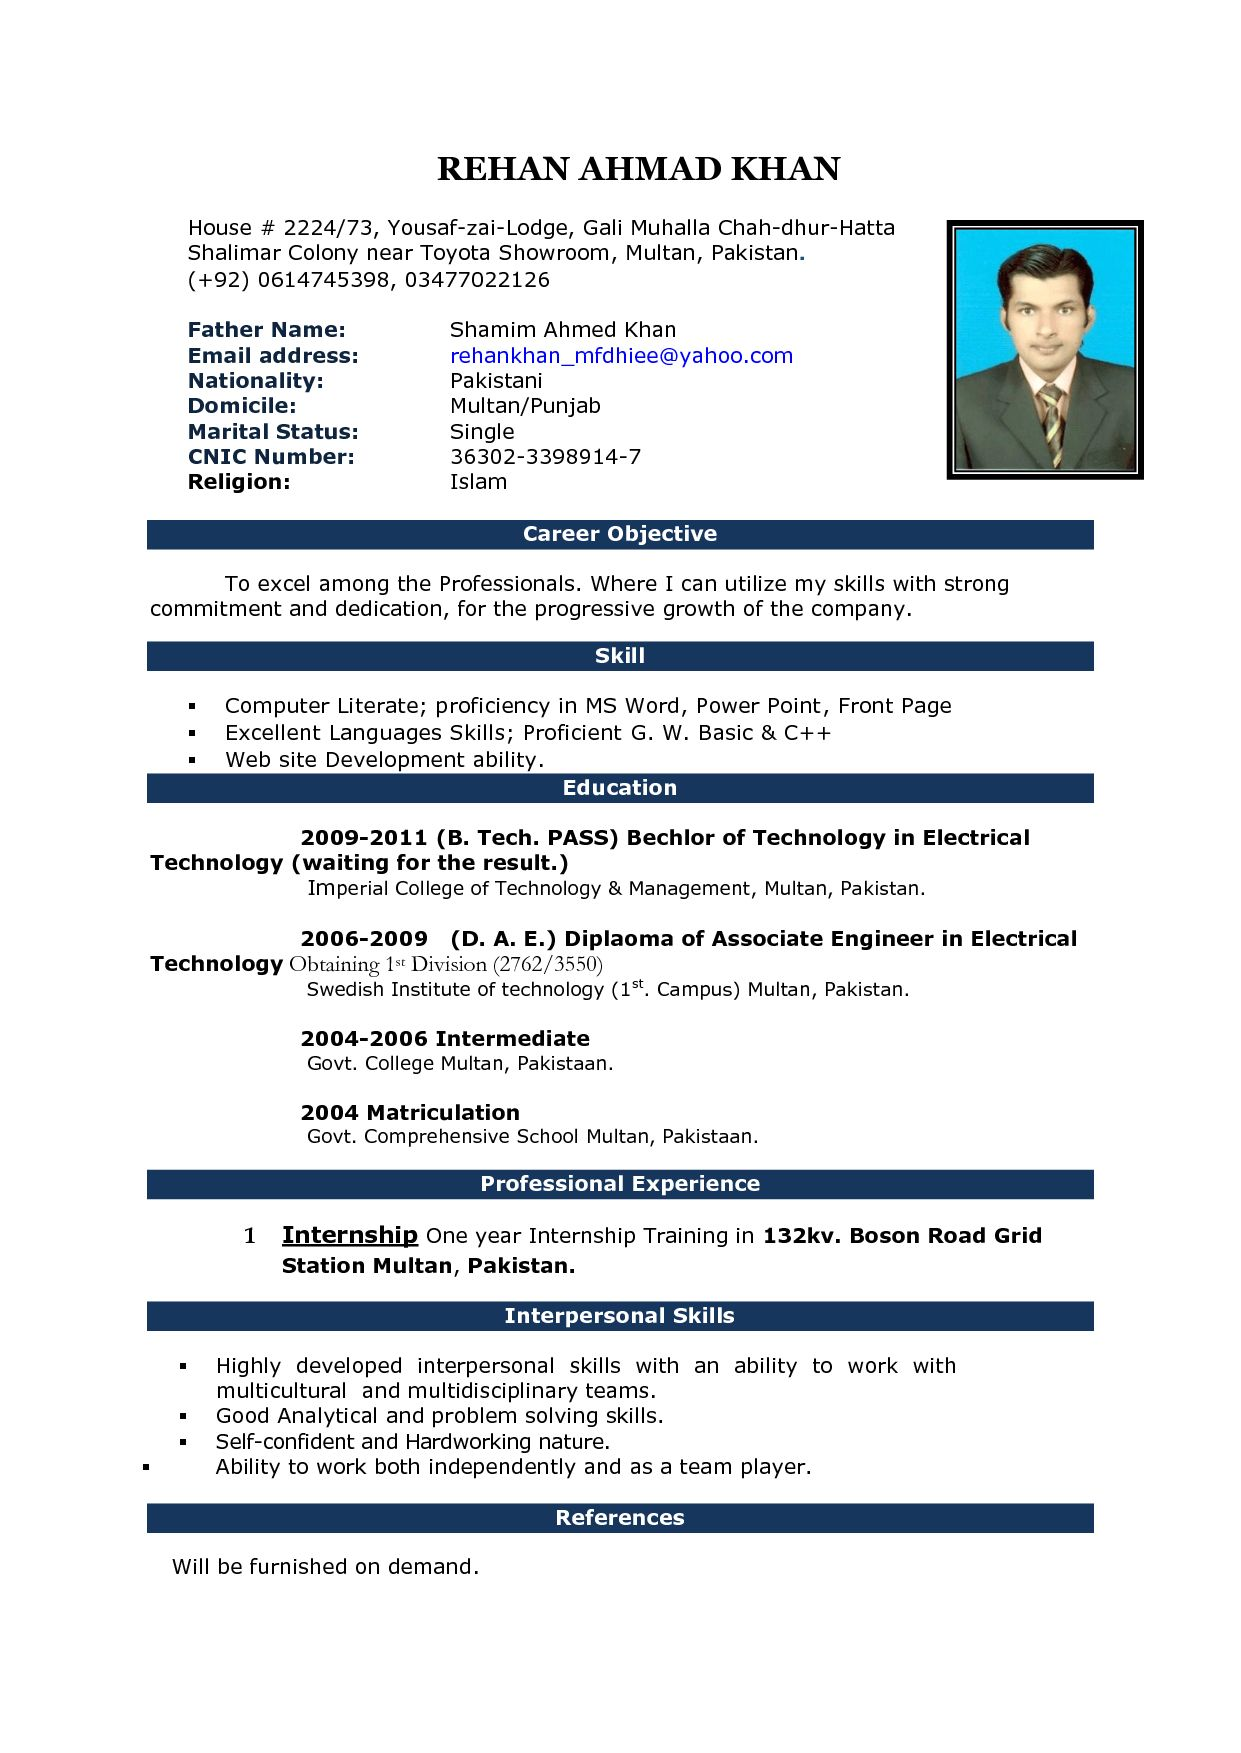 004 Curriculum Vitae Templates Microsoft Word Cv Pattern 2